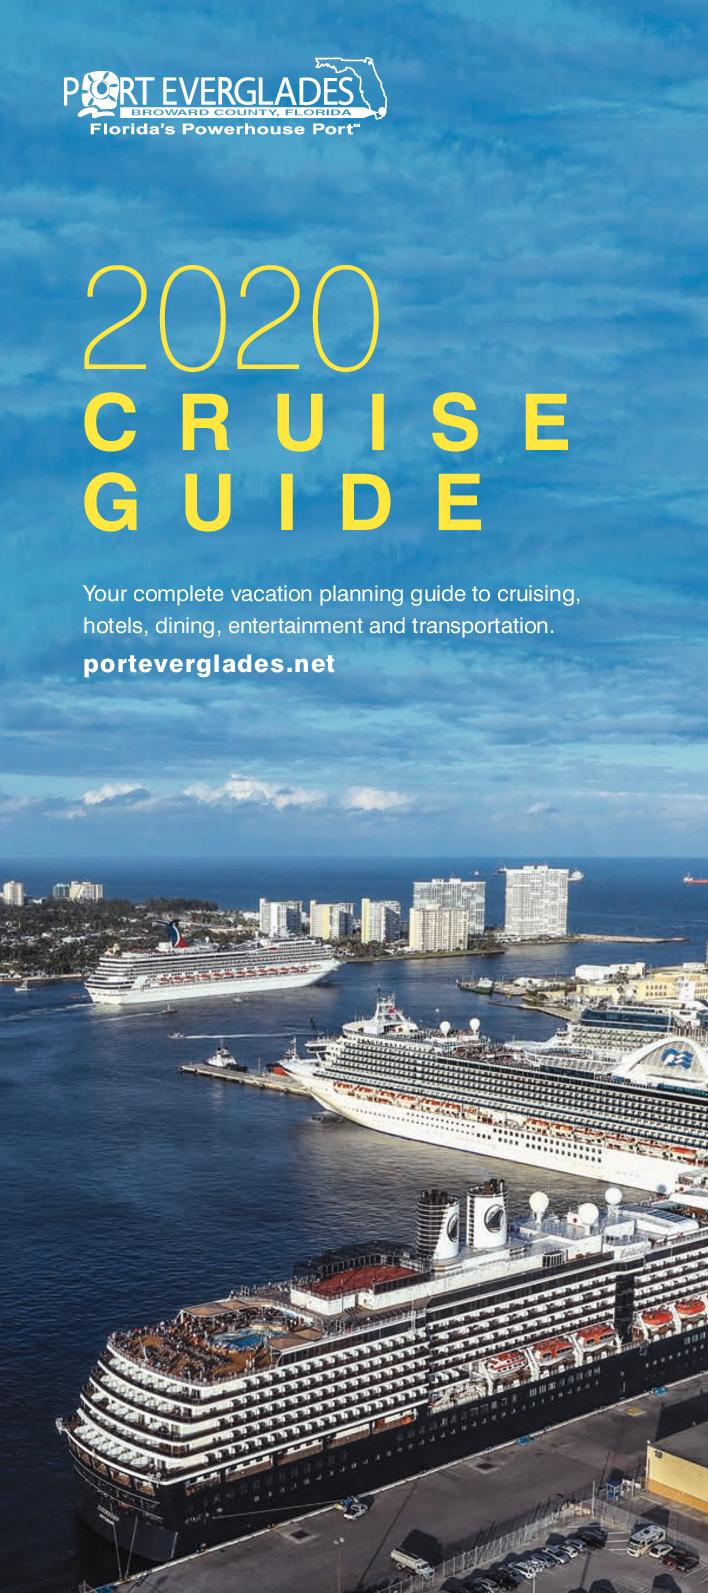 Port Everglades Cruise Schedule 2020.Calameo Port Everglades Cruise Guide 2020